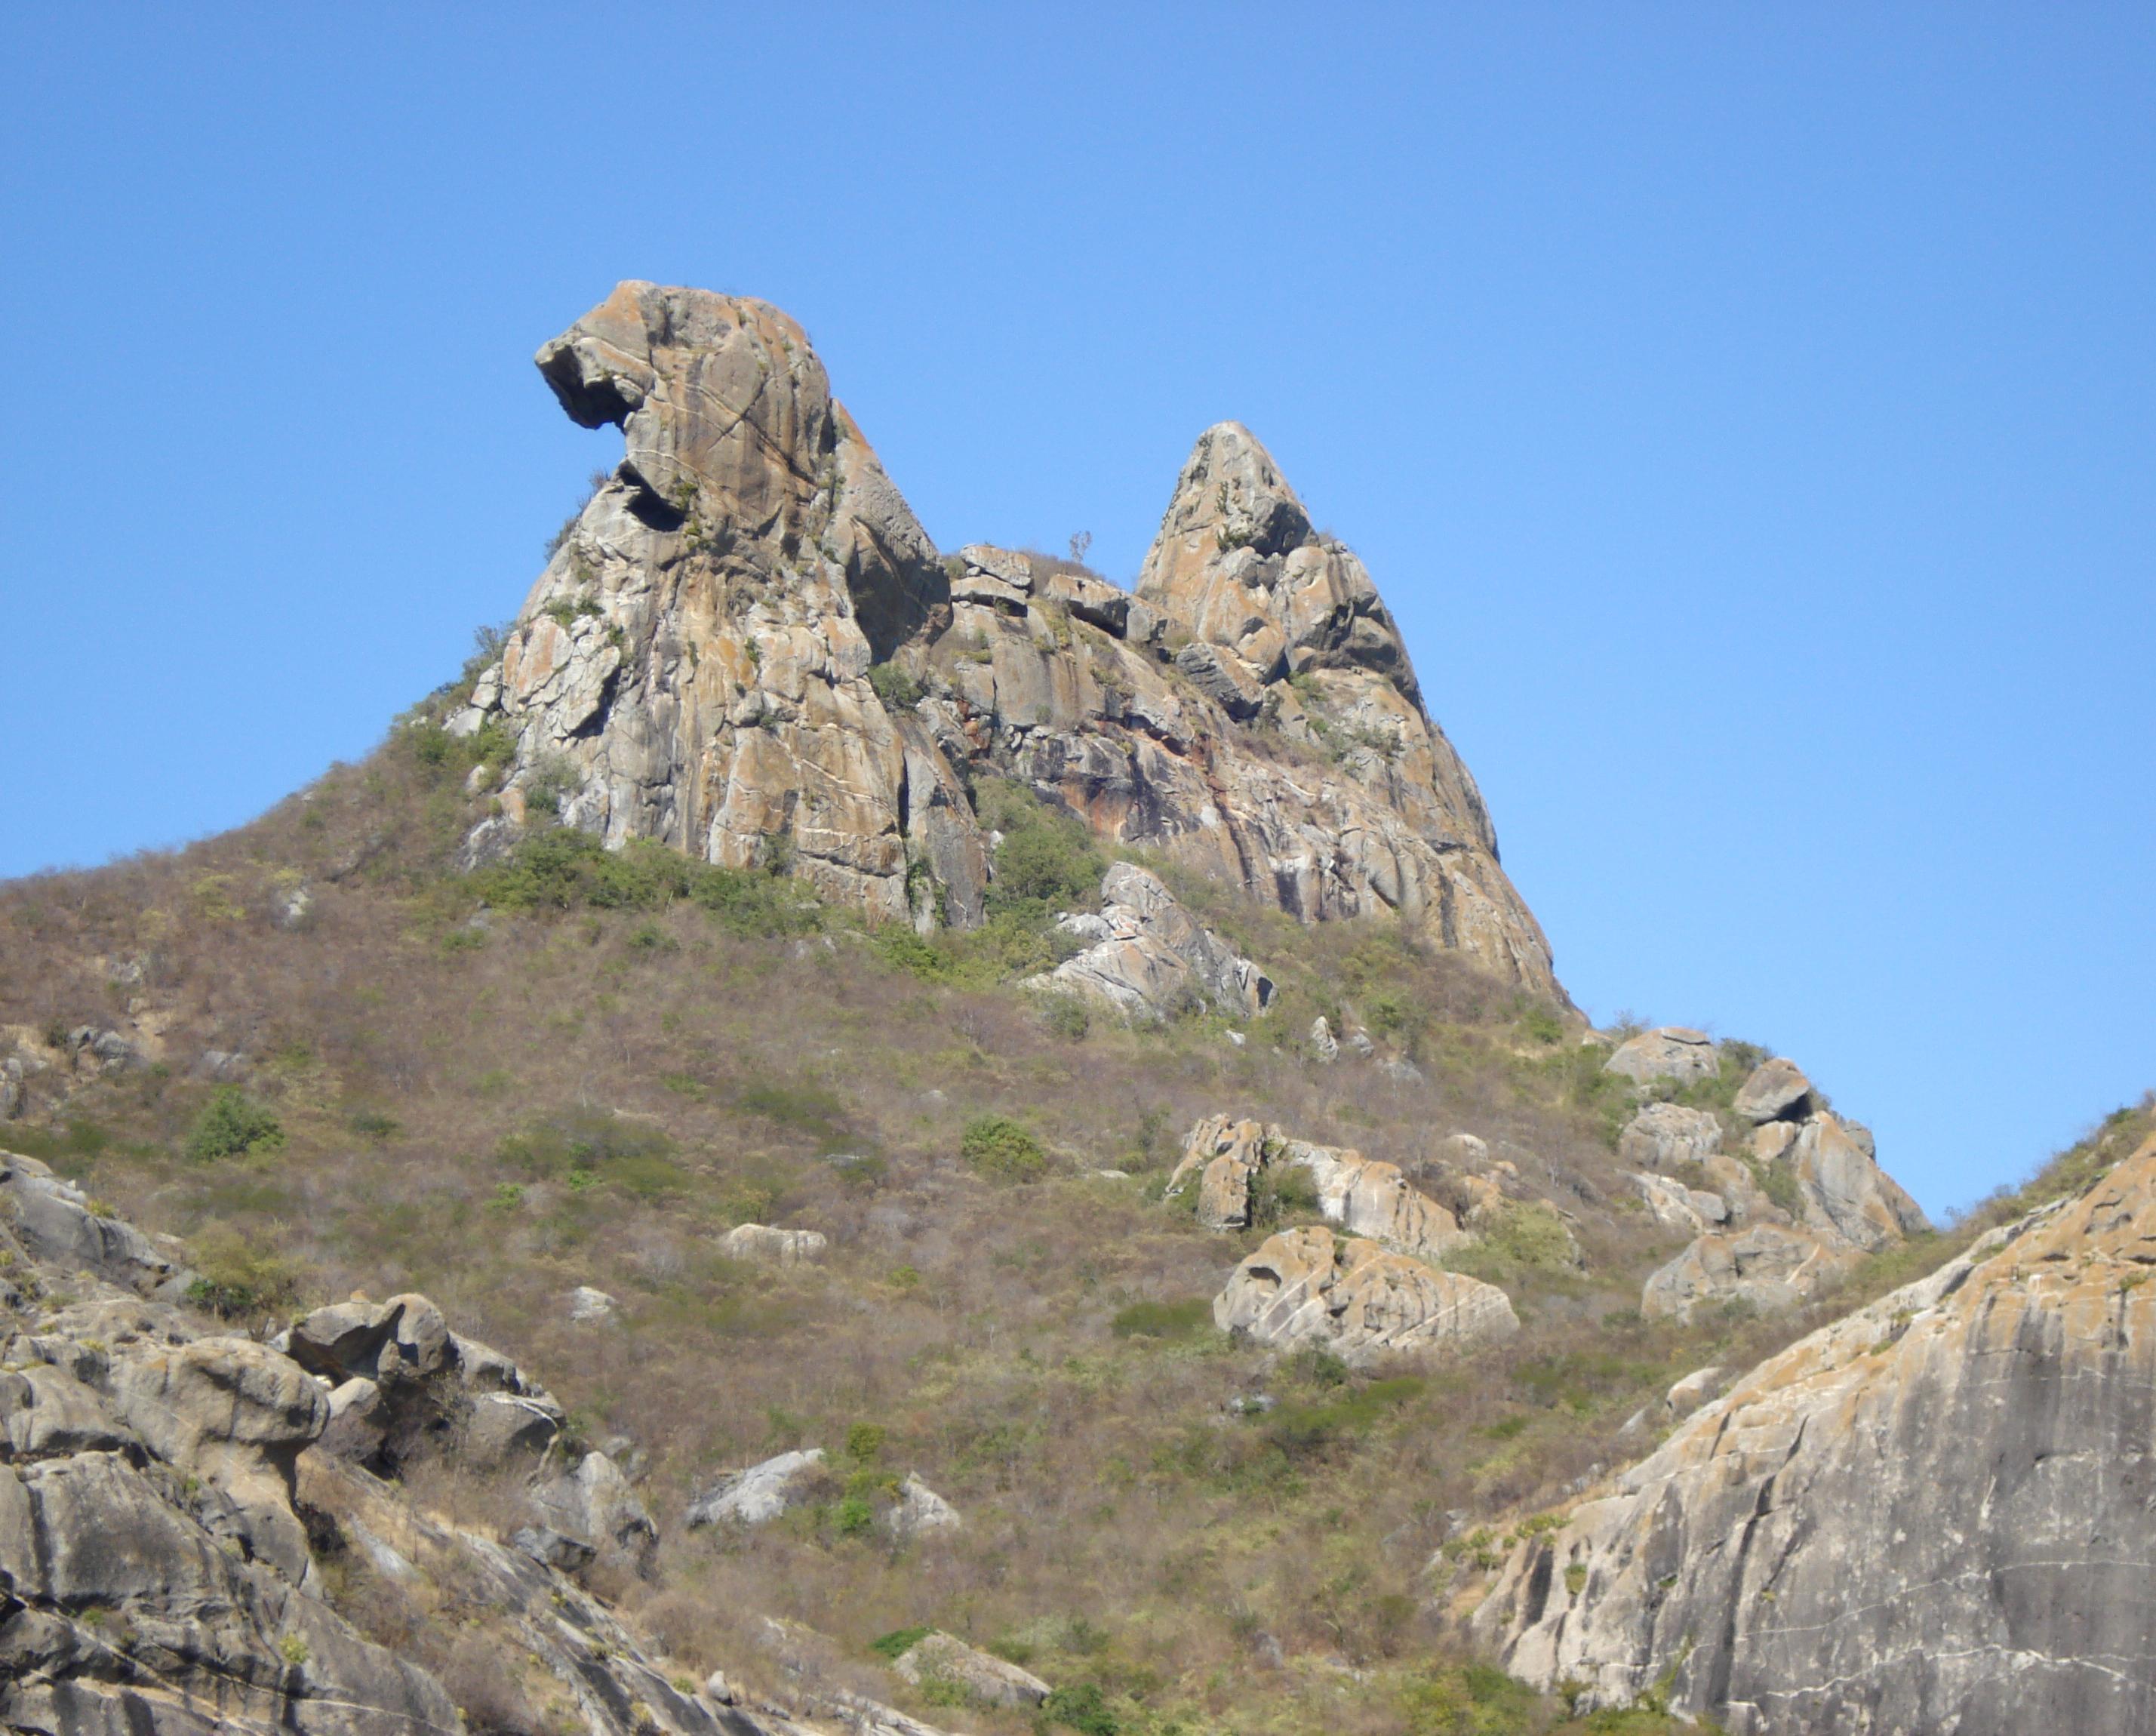 Quixadá Ceará fonte: upload.wikimedia.org